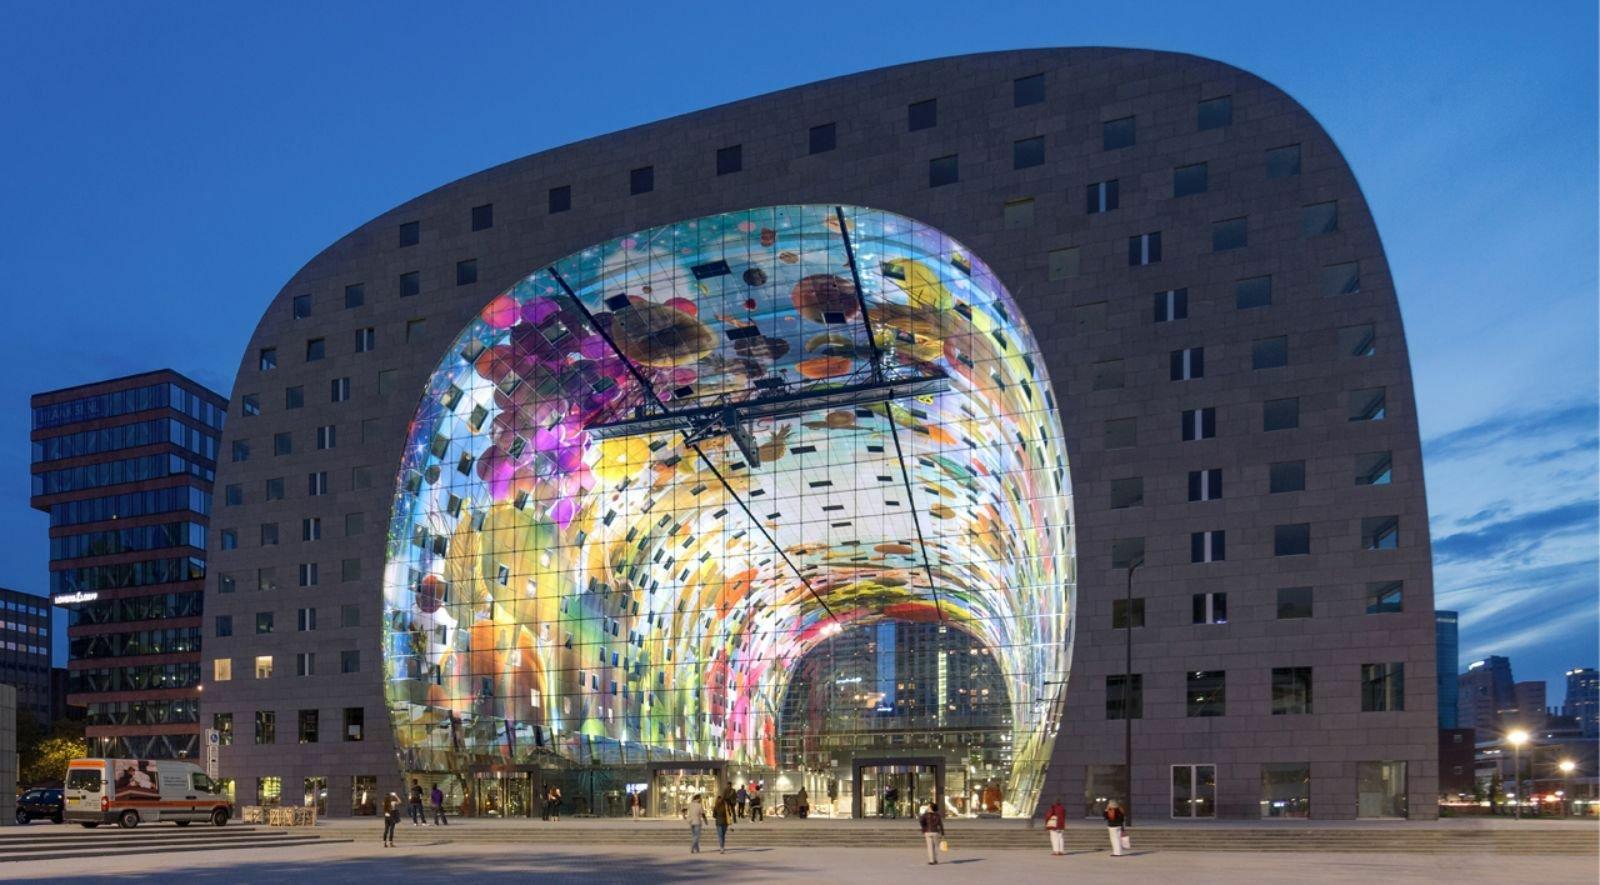 mvrdv-wins-rotterdam-s-marketing-award-2014-for-markthal-00643106136.jpg